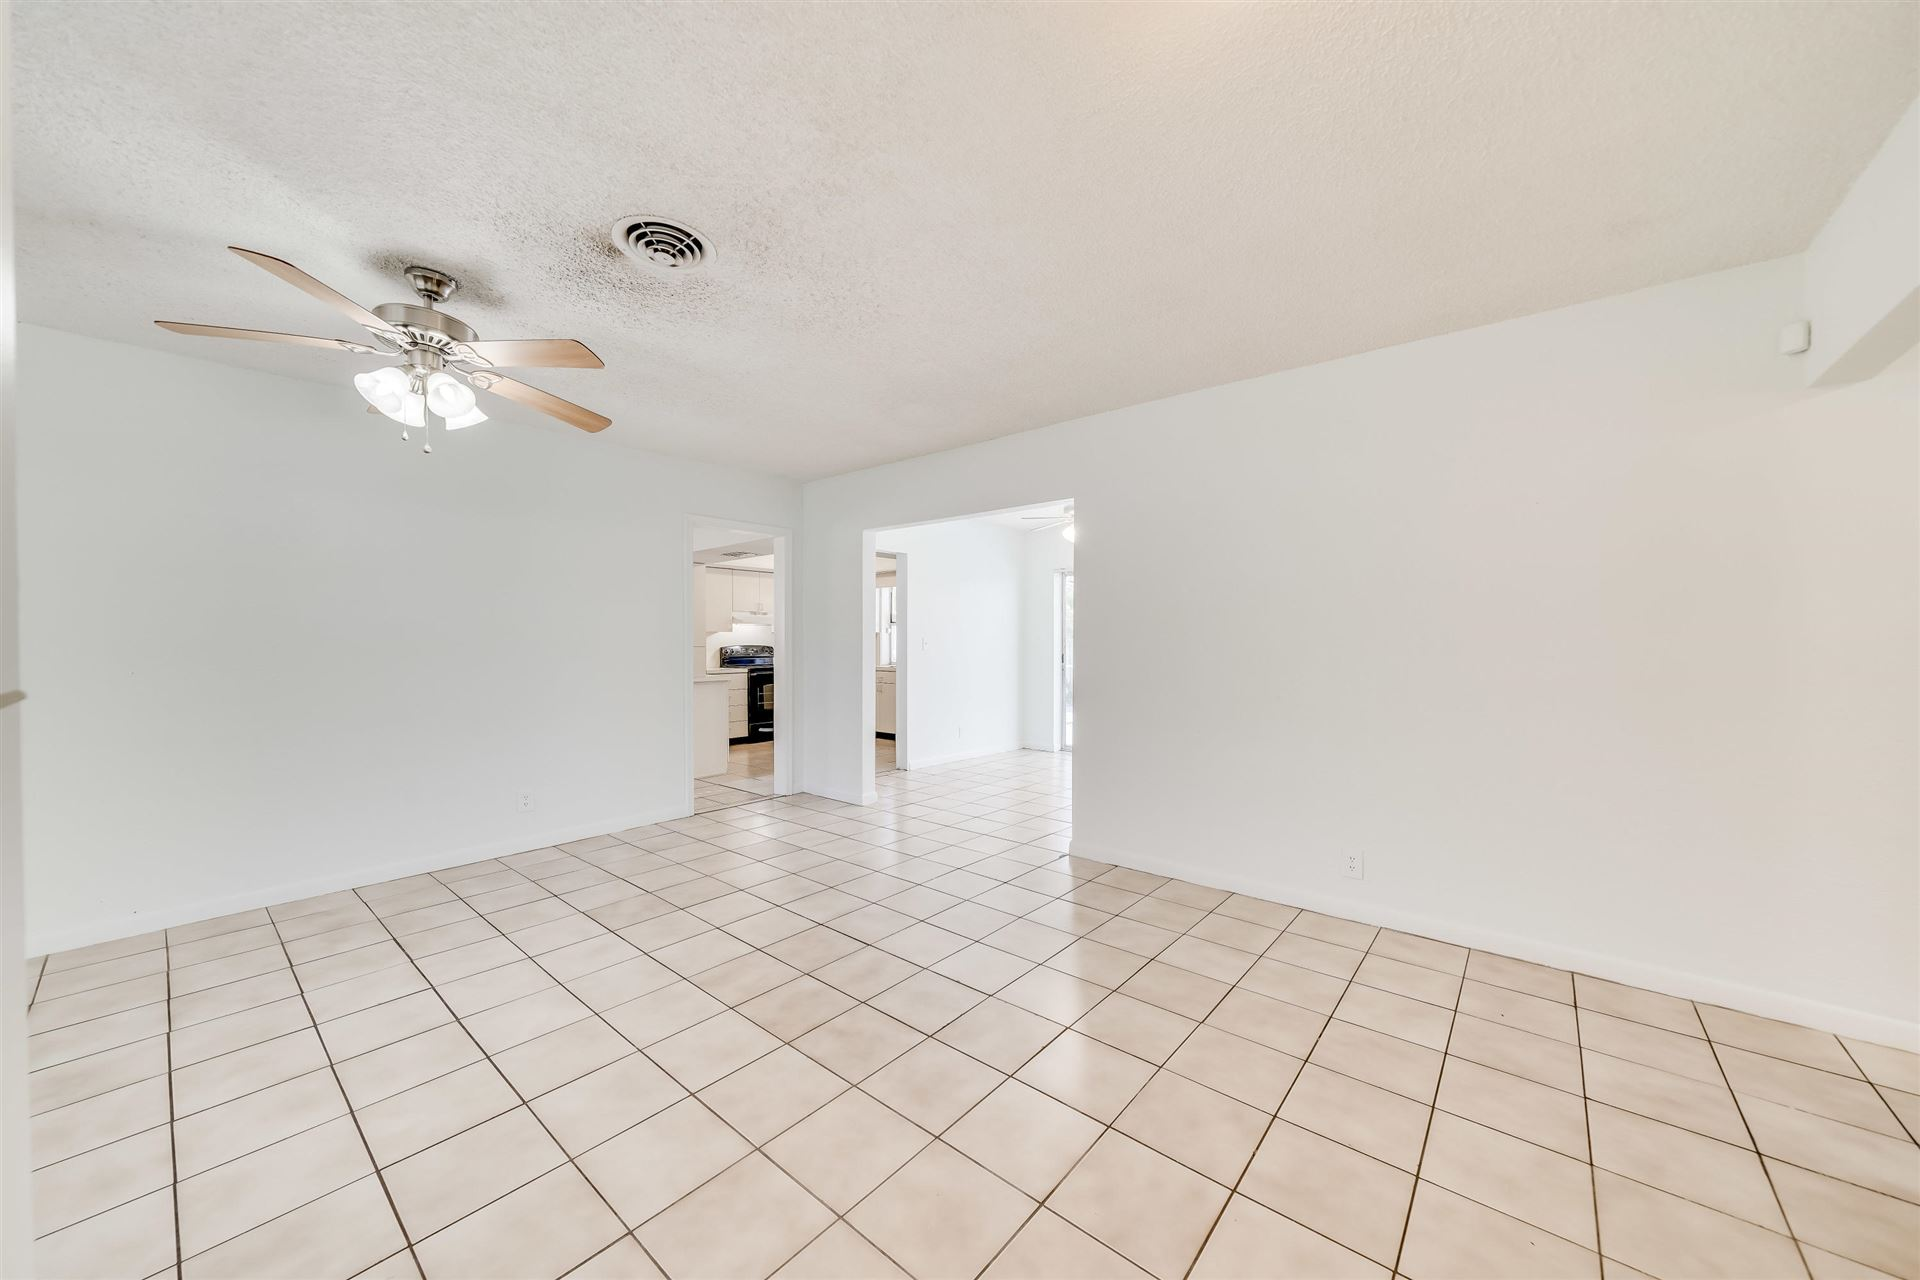 Photo of 6371 SW 10 Court, North Lauderdale, FL 33068 (MLS # RX-10672258)